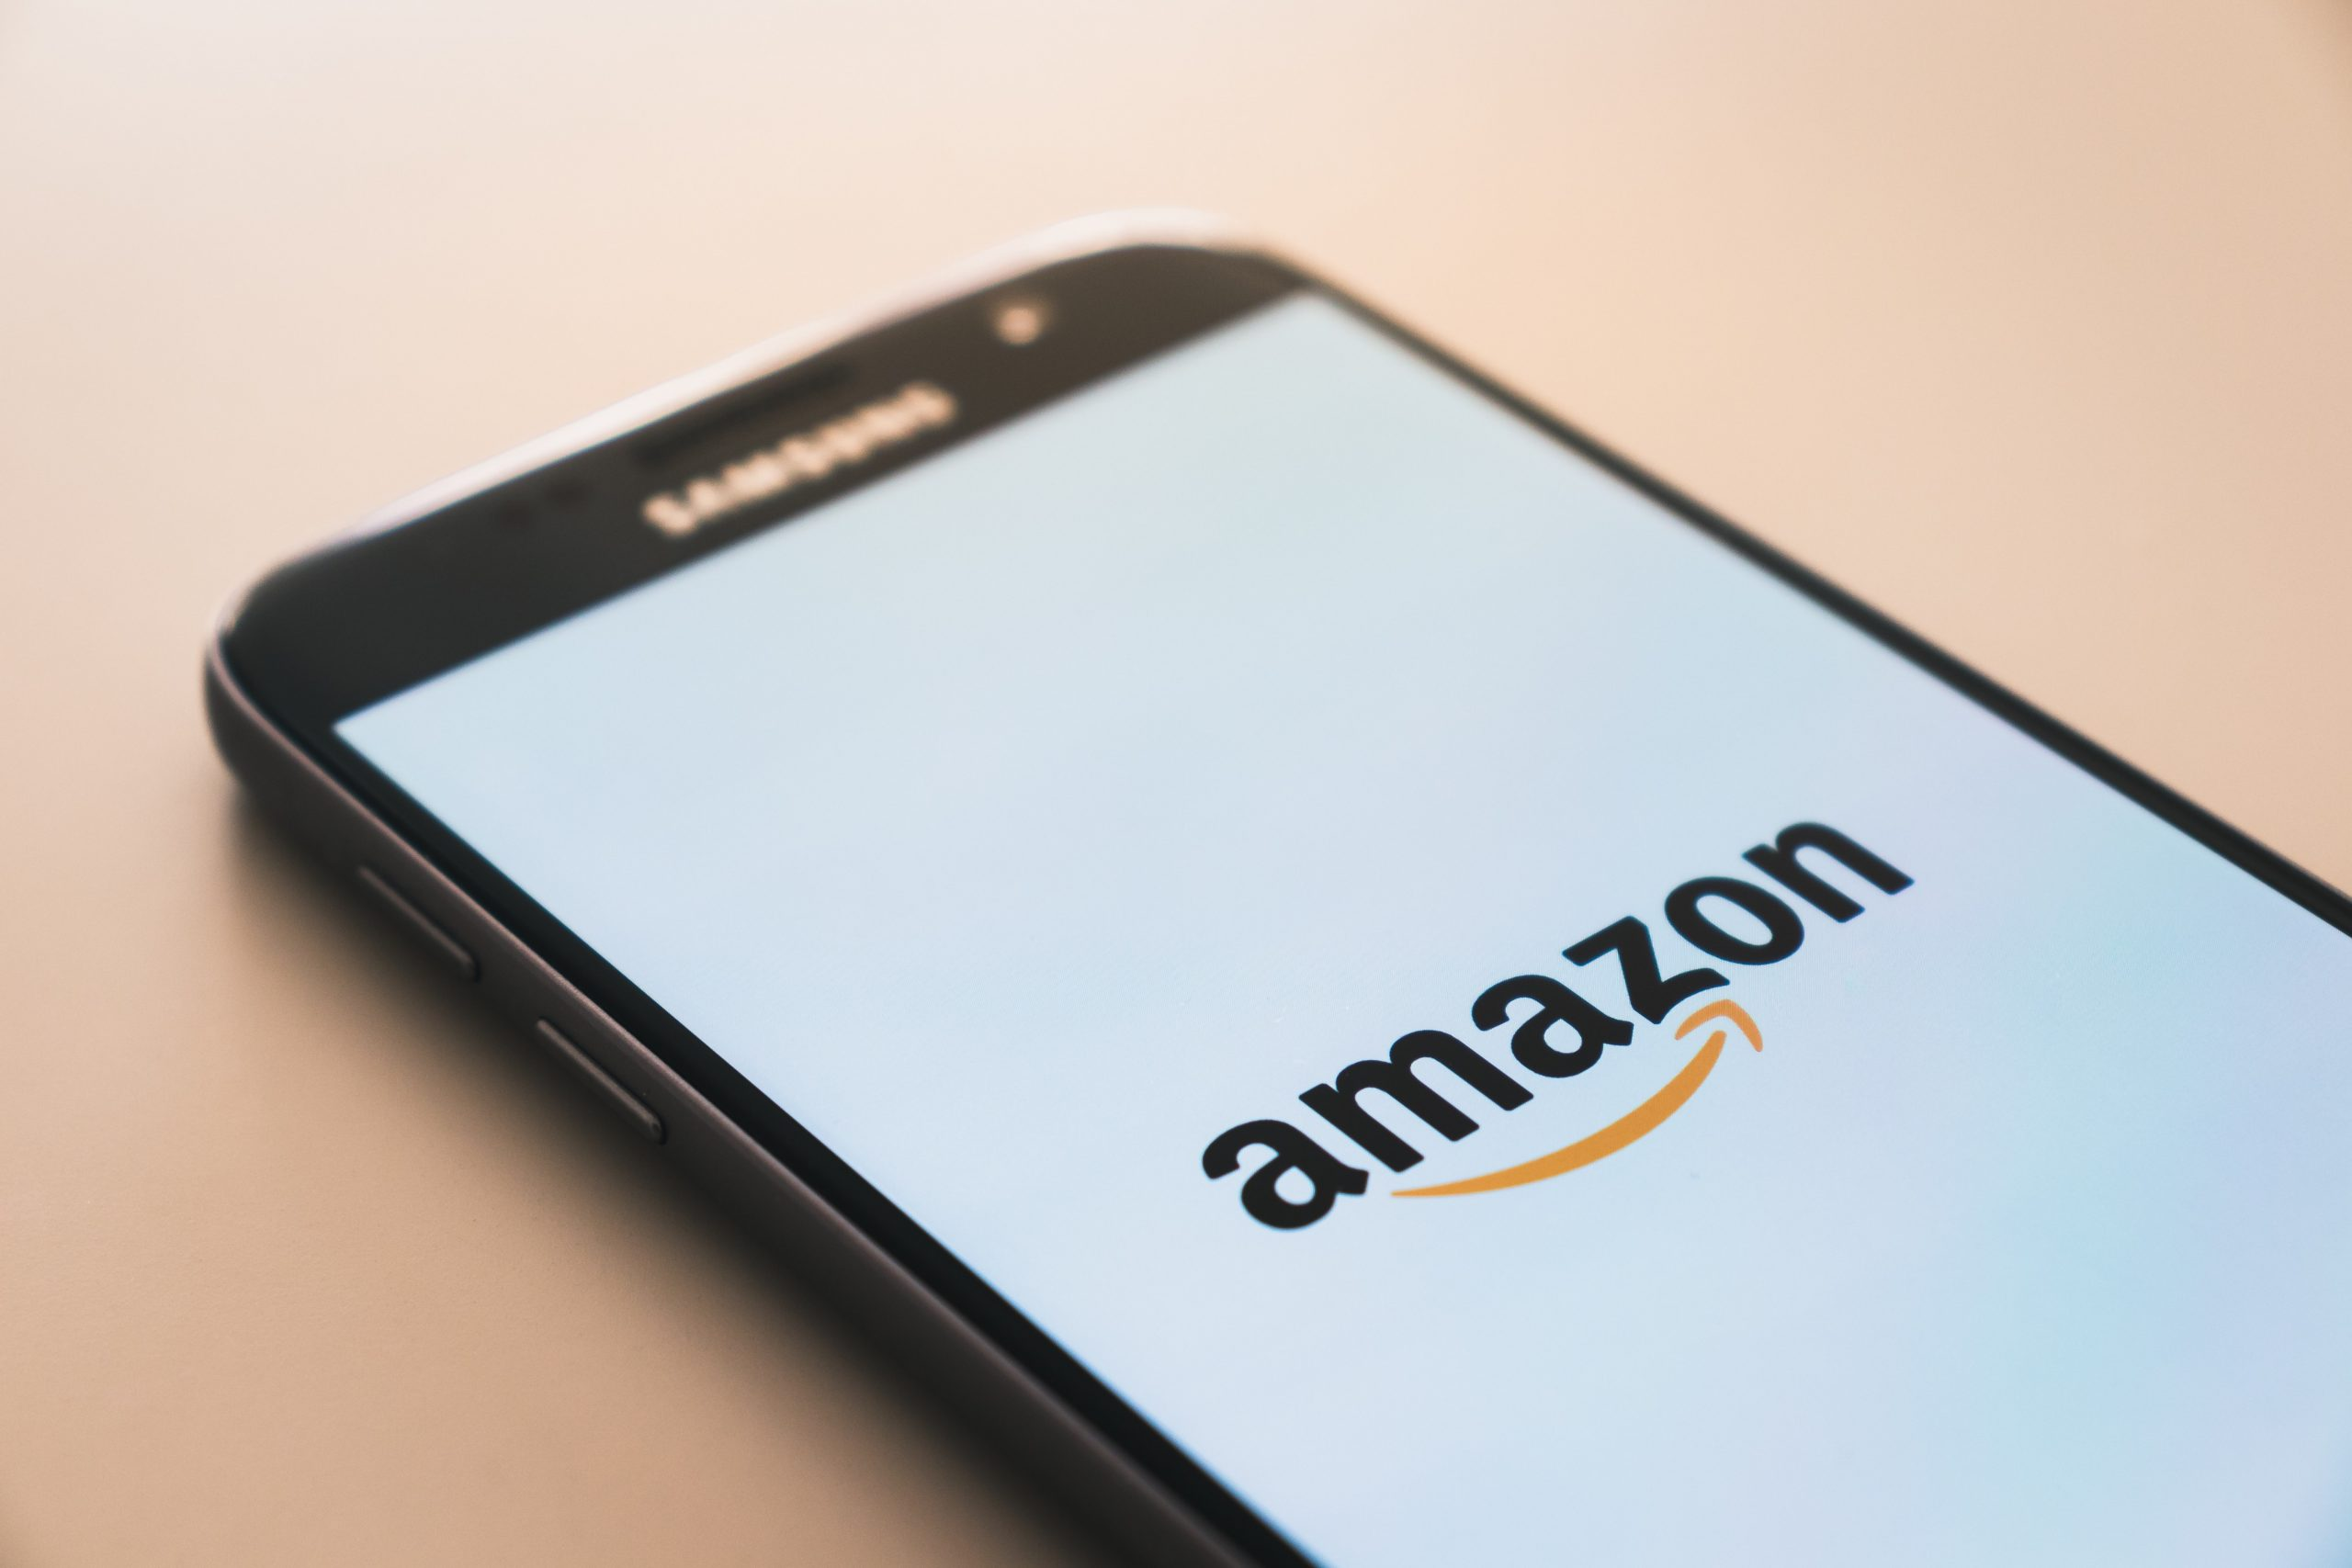 Dropshipping vs Amazon FBA